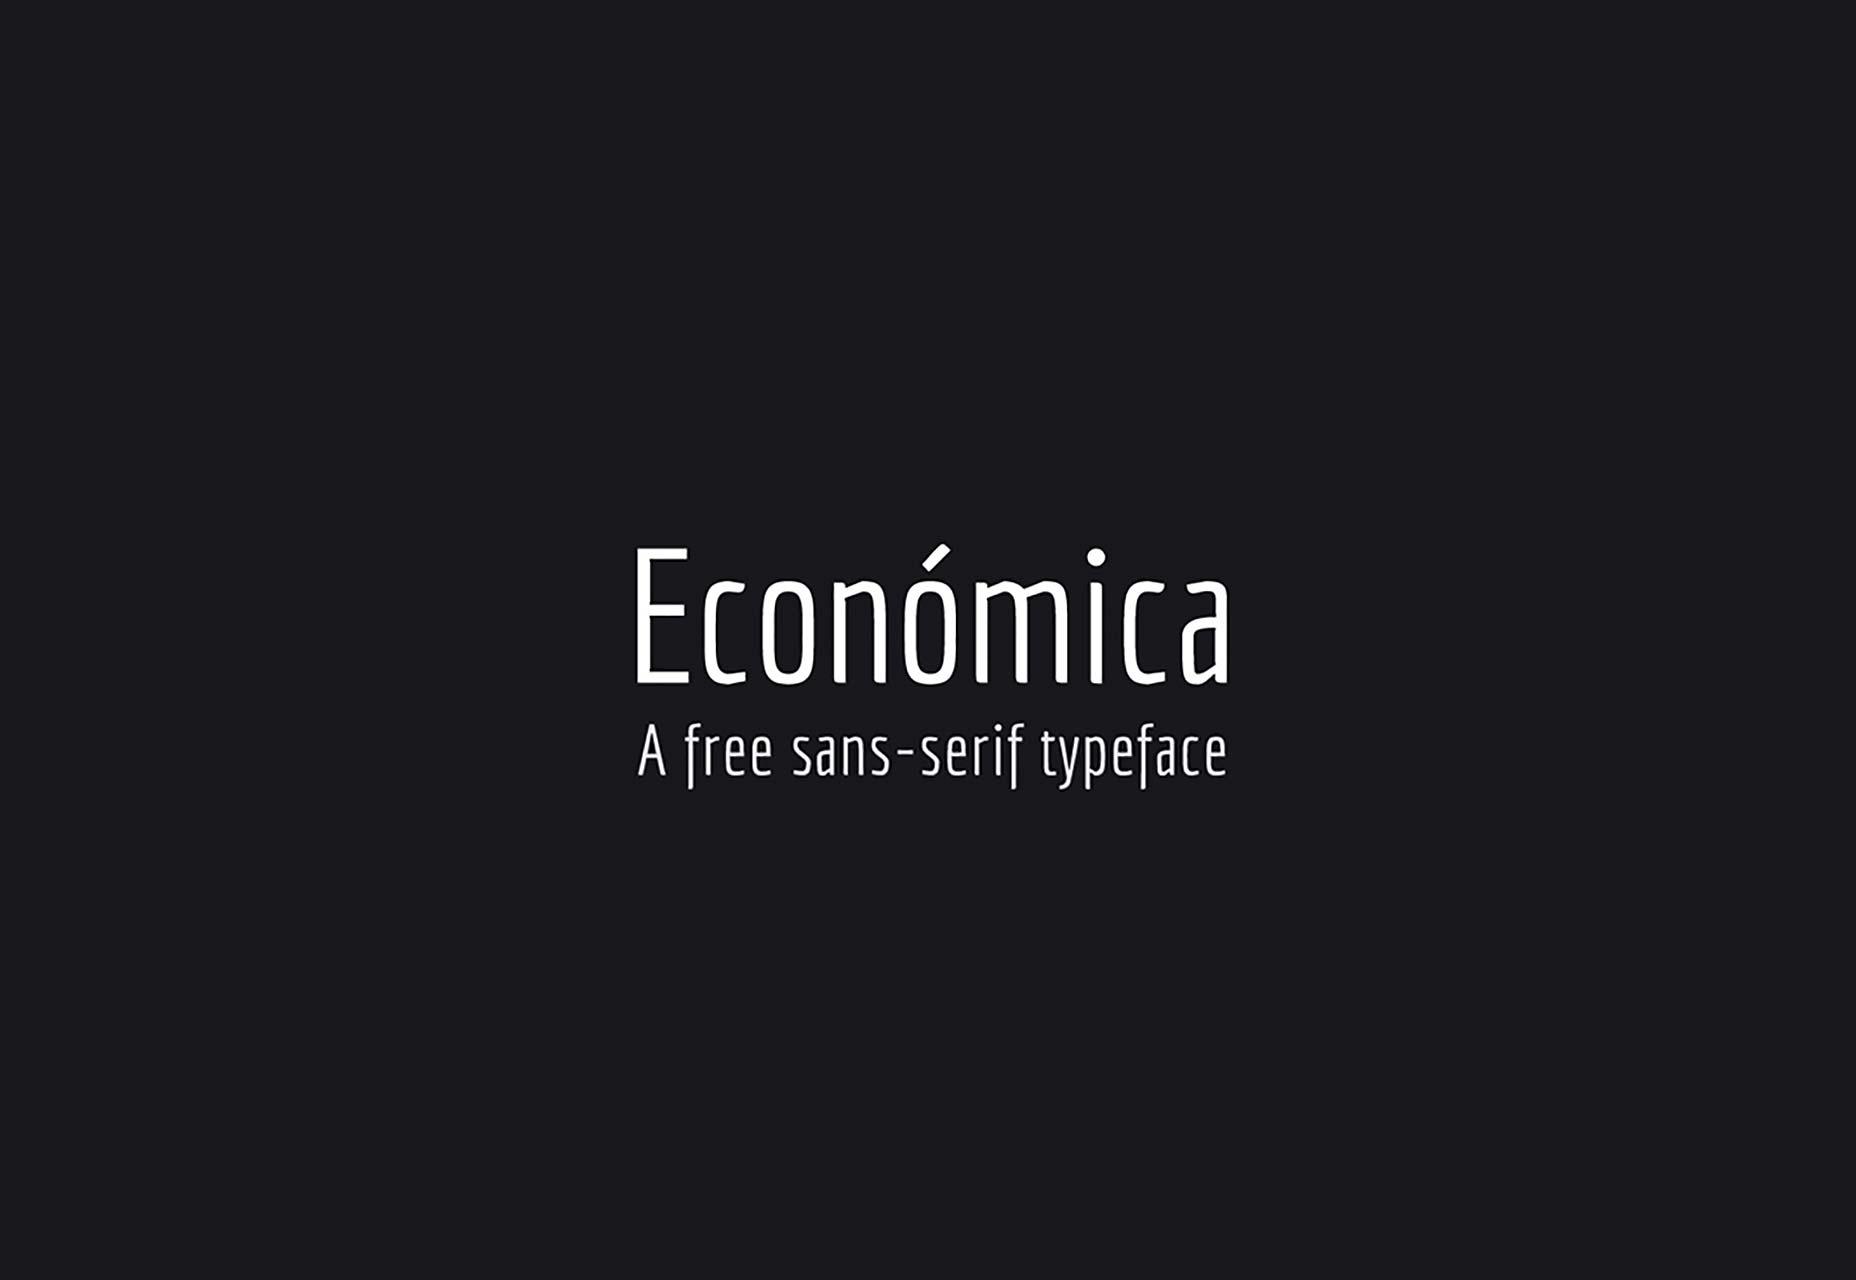 Economica 海报logo设计字体 简洁纤细 英文字体下载